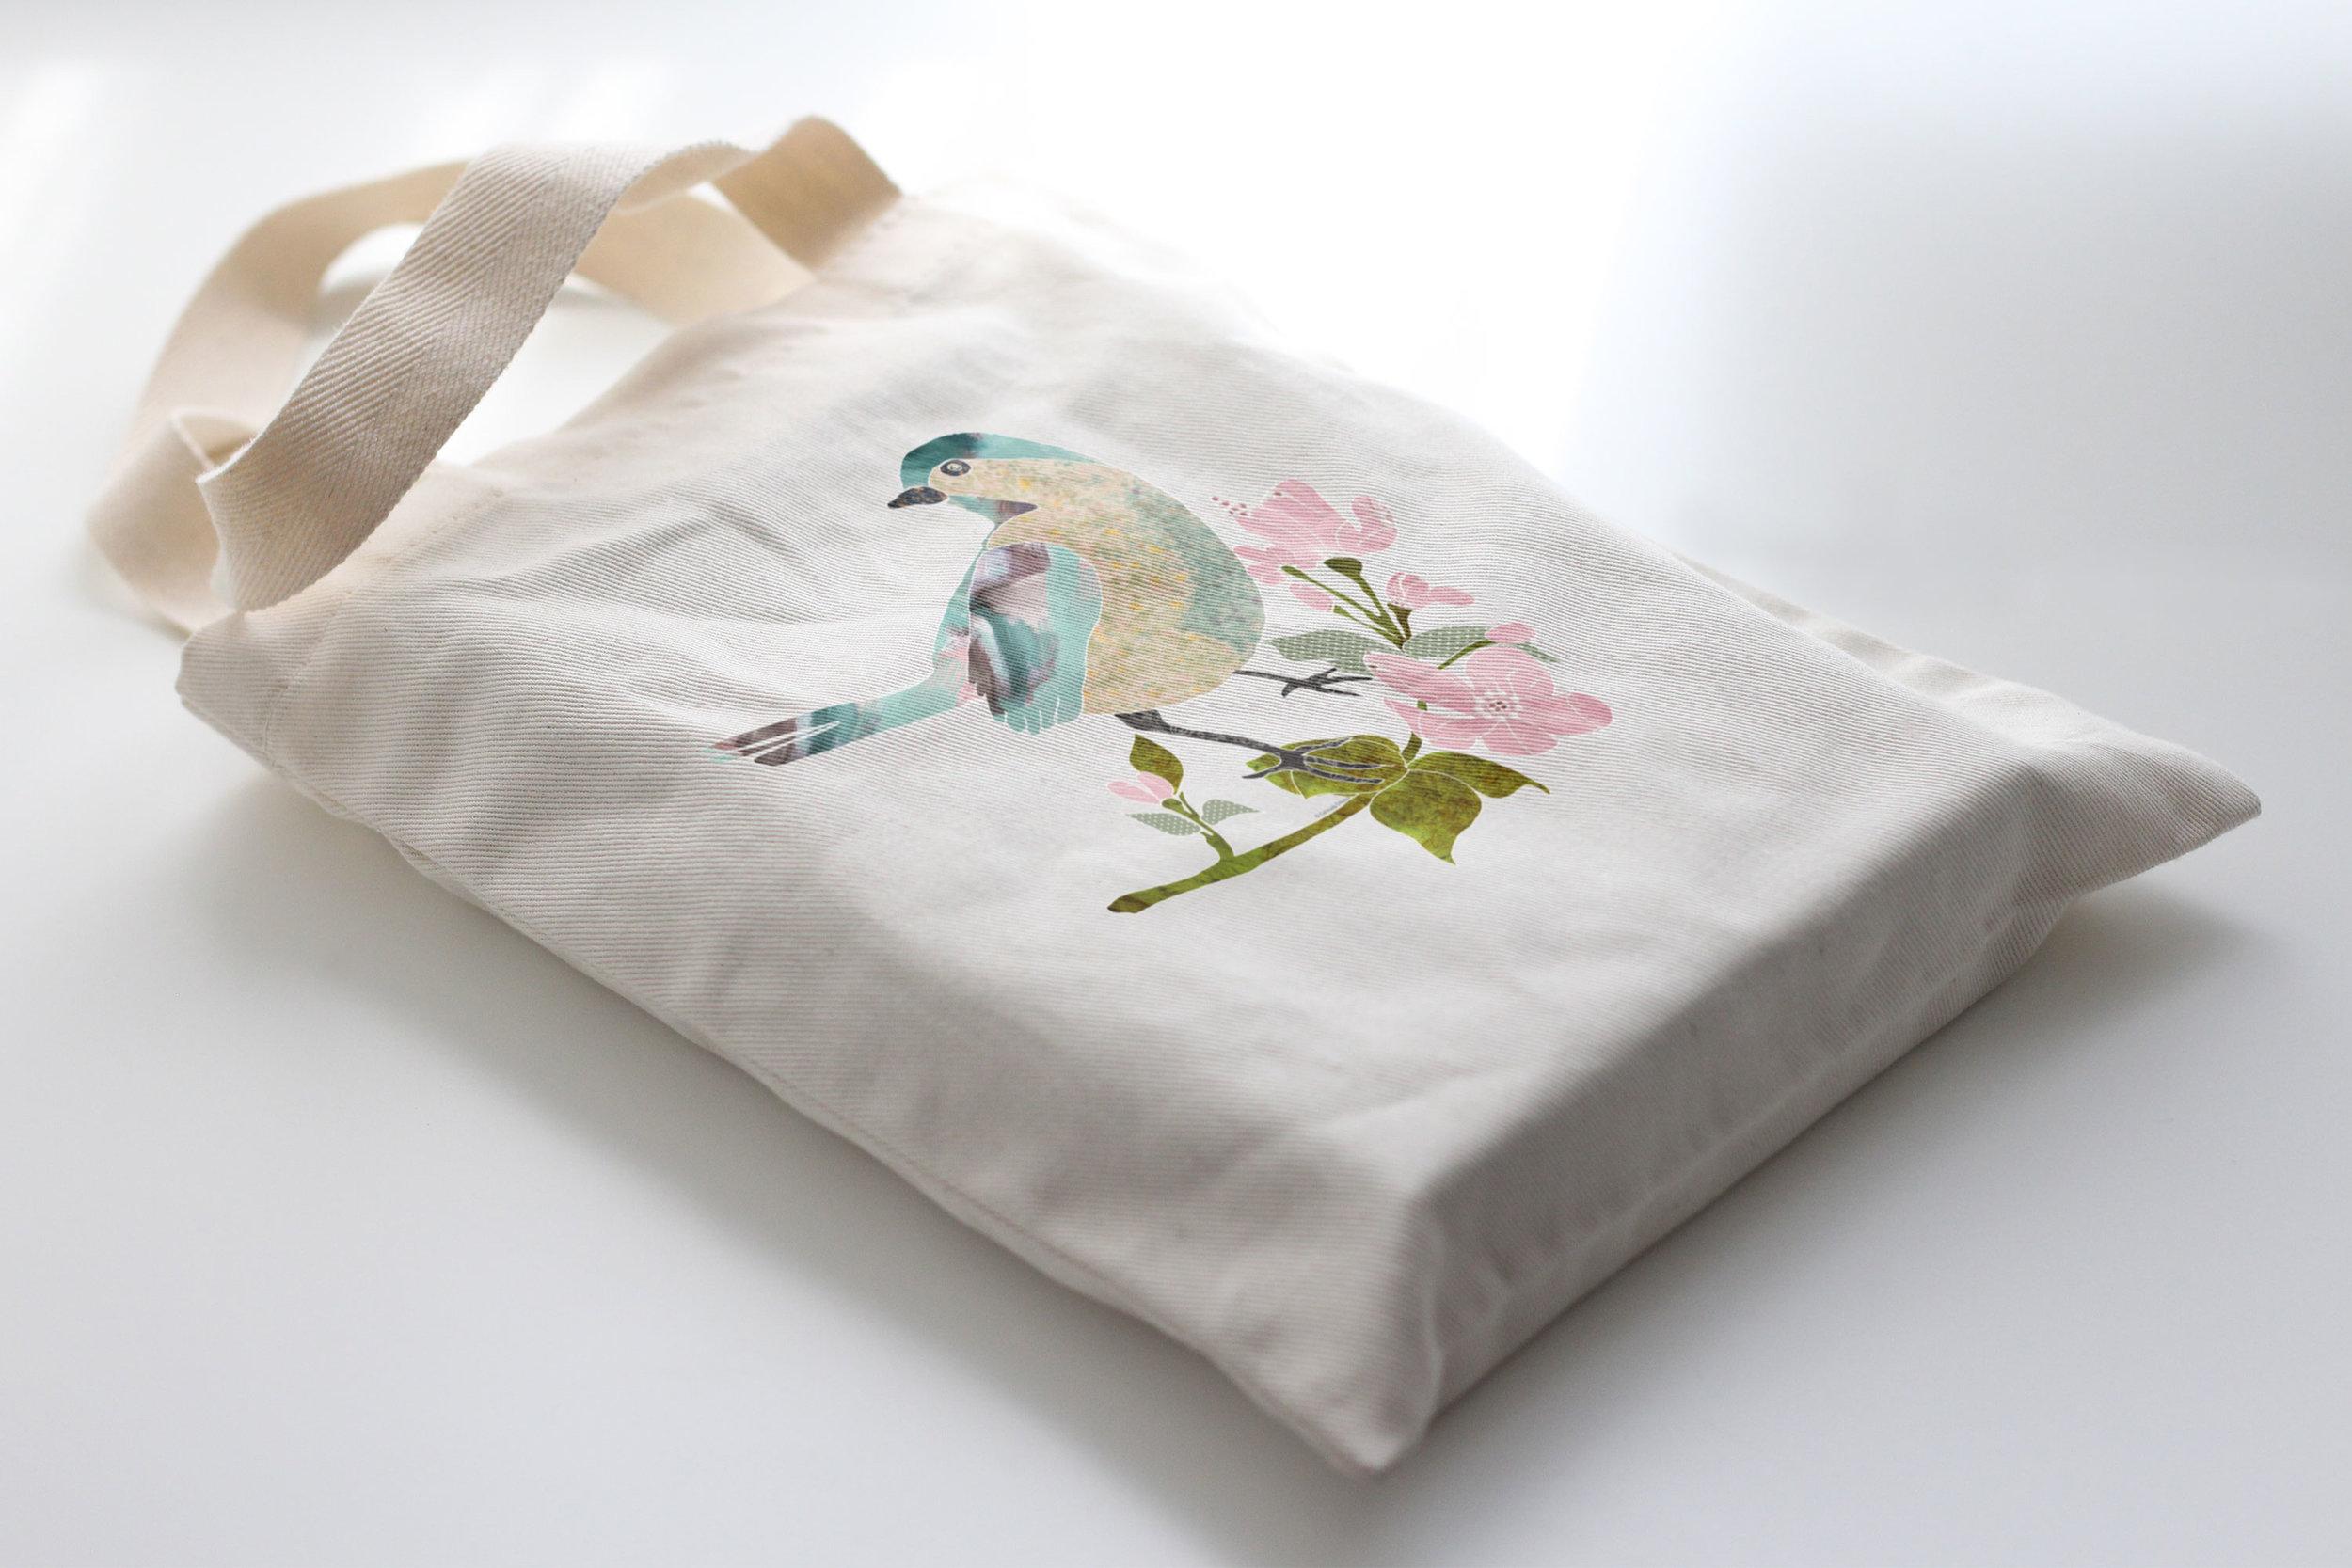 1.5. Birdependant-Bird-Art-Illustration-Curiously-Creative-NZ-Tote-Bag-2.jpg